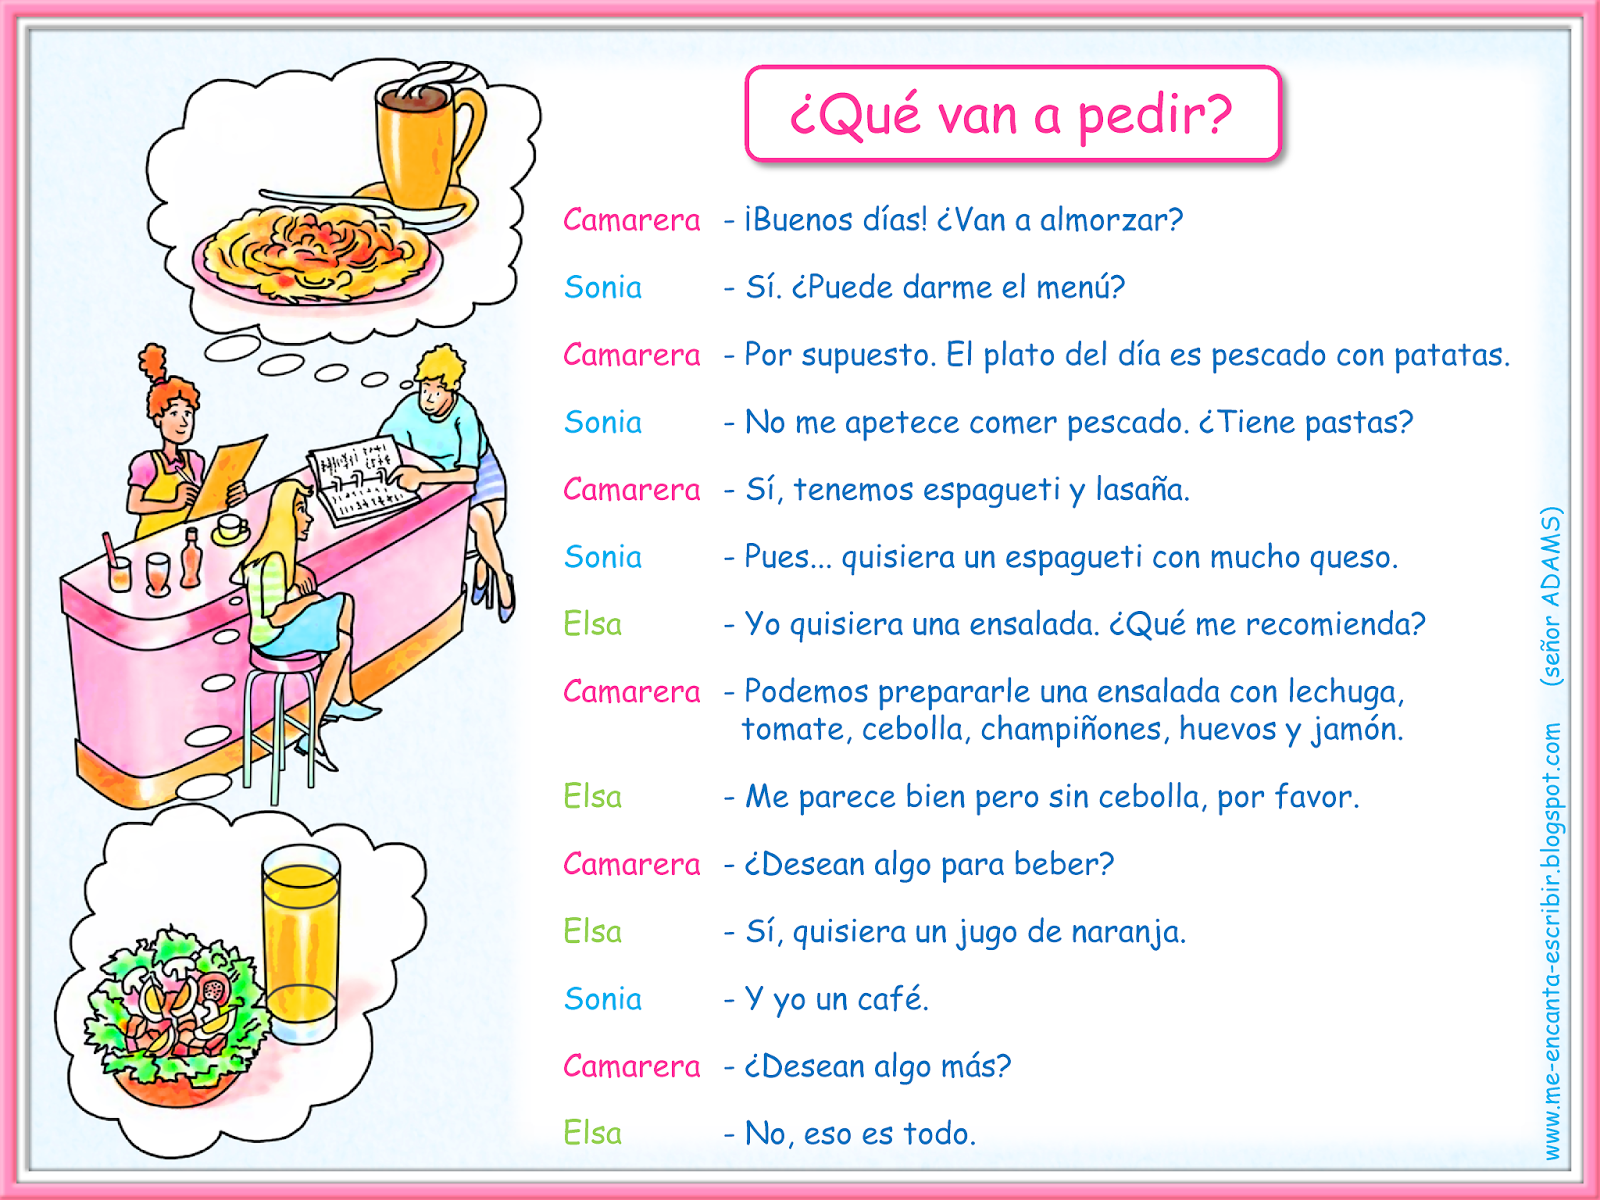 28 best spanish activities images on pinterest teaching spanish me encanta escribir en espaol dilogo en un restaurante qu van a pedir robcynllc Image collections